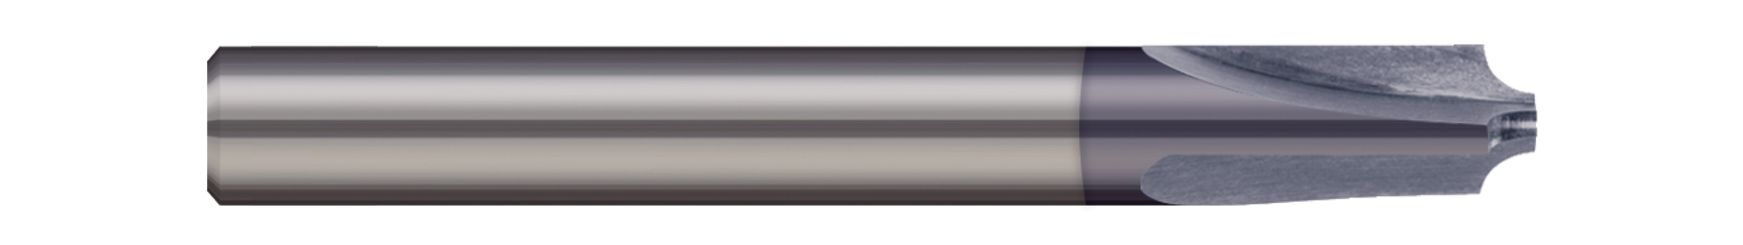 tool-details-CREM-060-150X